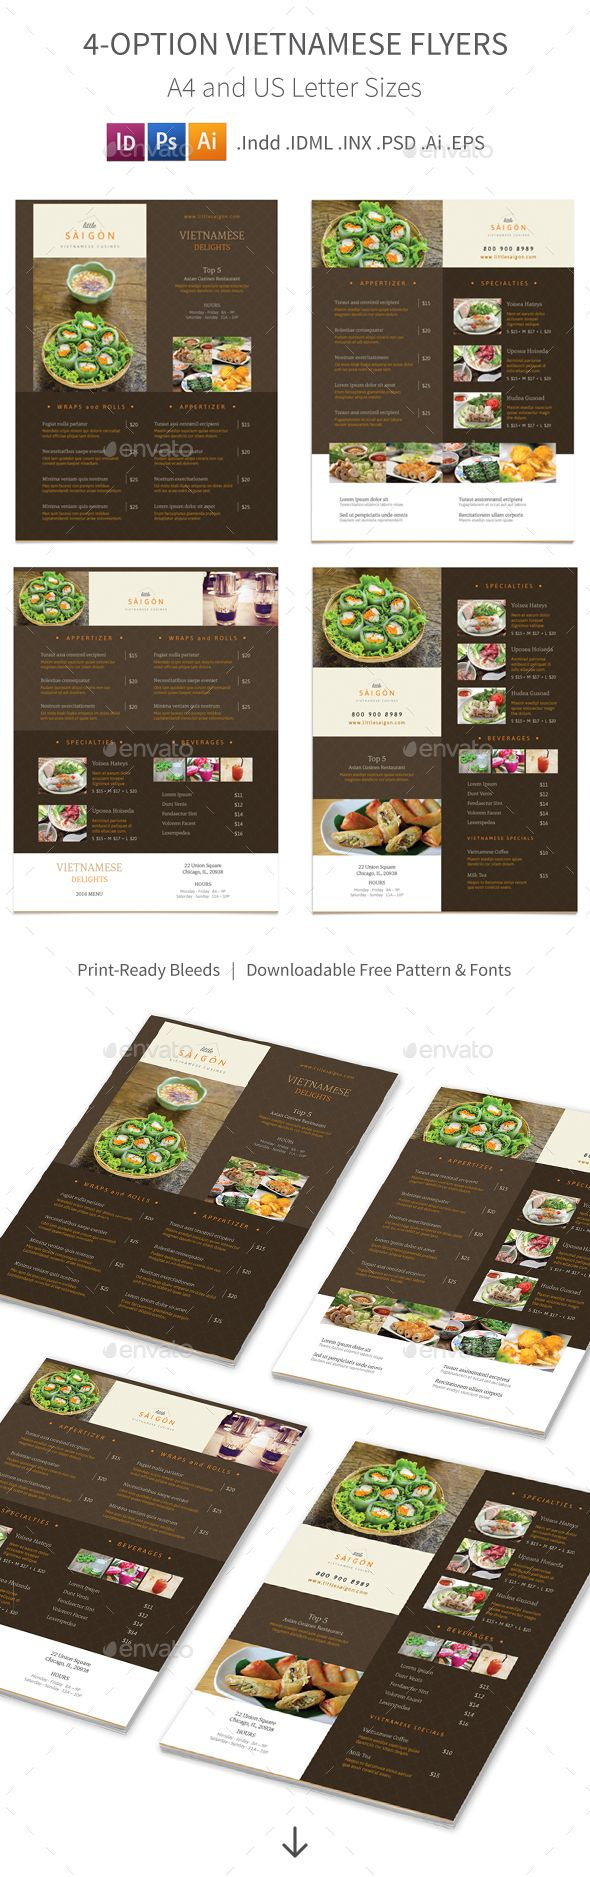 Vietnamese Restaurant Menu Flyers 2 – 4 Options — Photoshop PSD #pantone #oriental • Available here → https://graphicriver.net/item/vietnamese-restaurant-menu-flyers-2-4-options/15531541?ref=pxcr